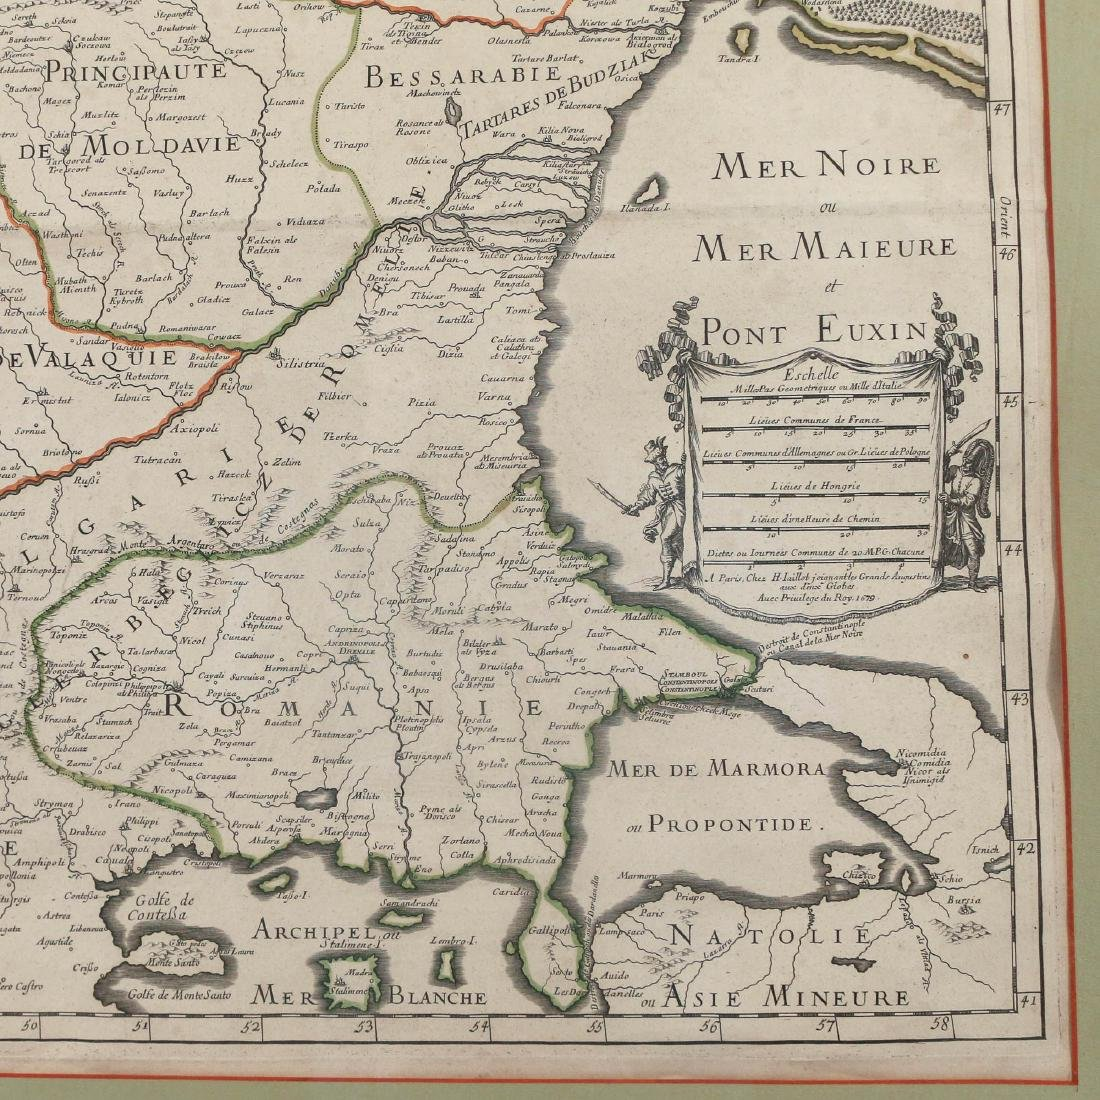 [JAILLOT] MAP OF HUNGARY & SURROUNDINGS - 5